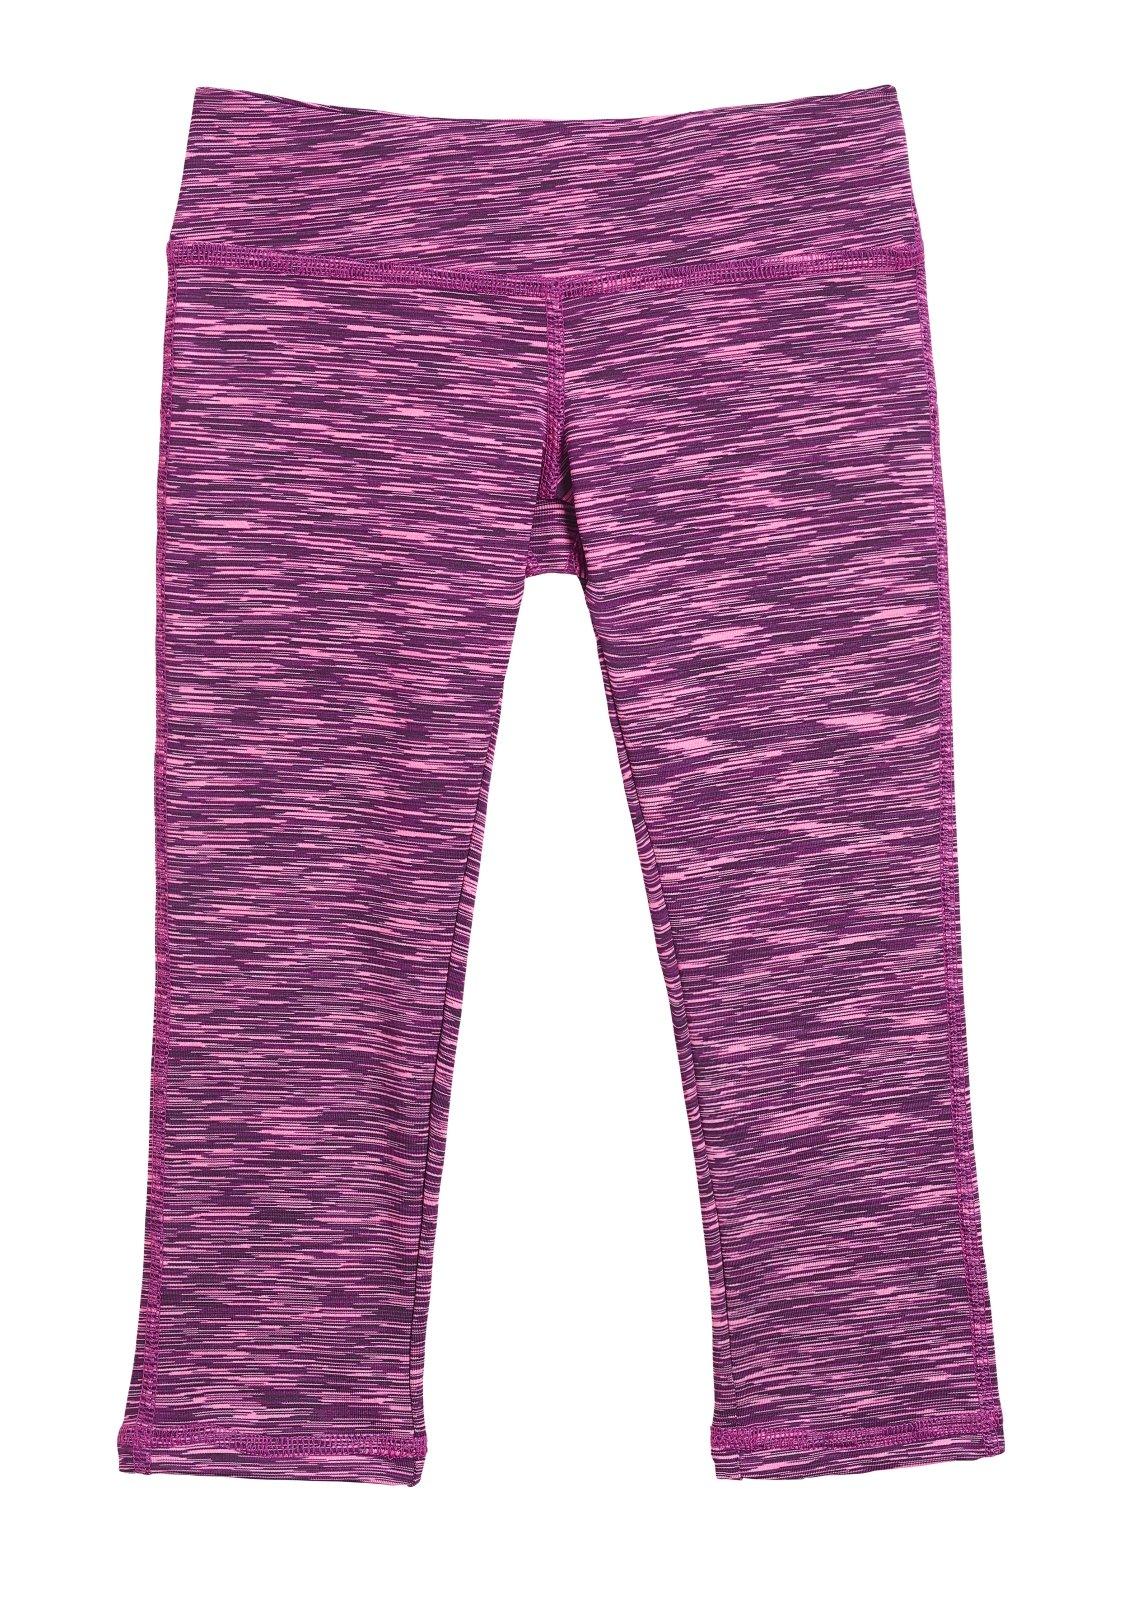 City Threads Girls' Workout Leggings Capri Summer High Performance Legging For School Camp Sports Dance Gymnastics and Playing, Pink/Purple/Black, 16